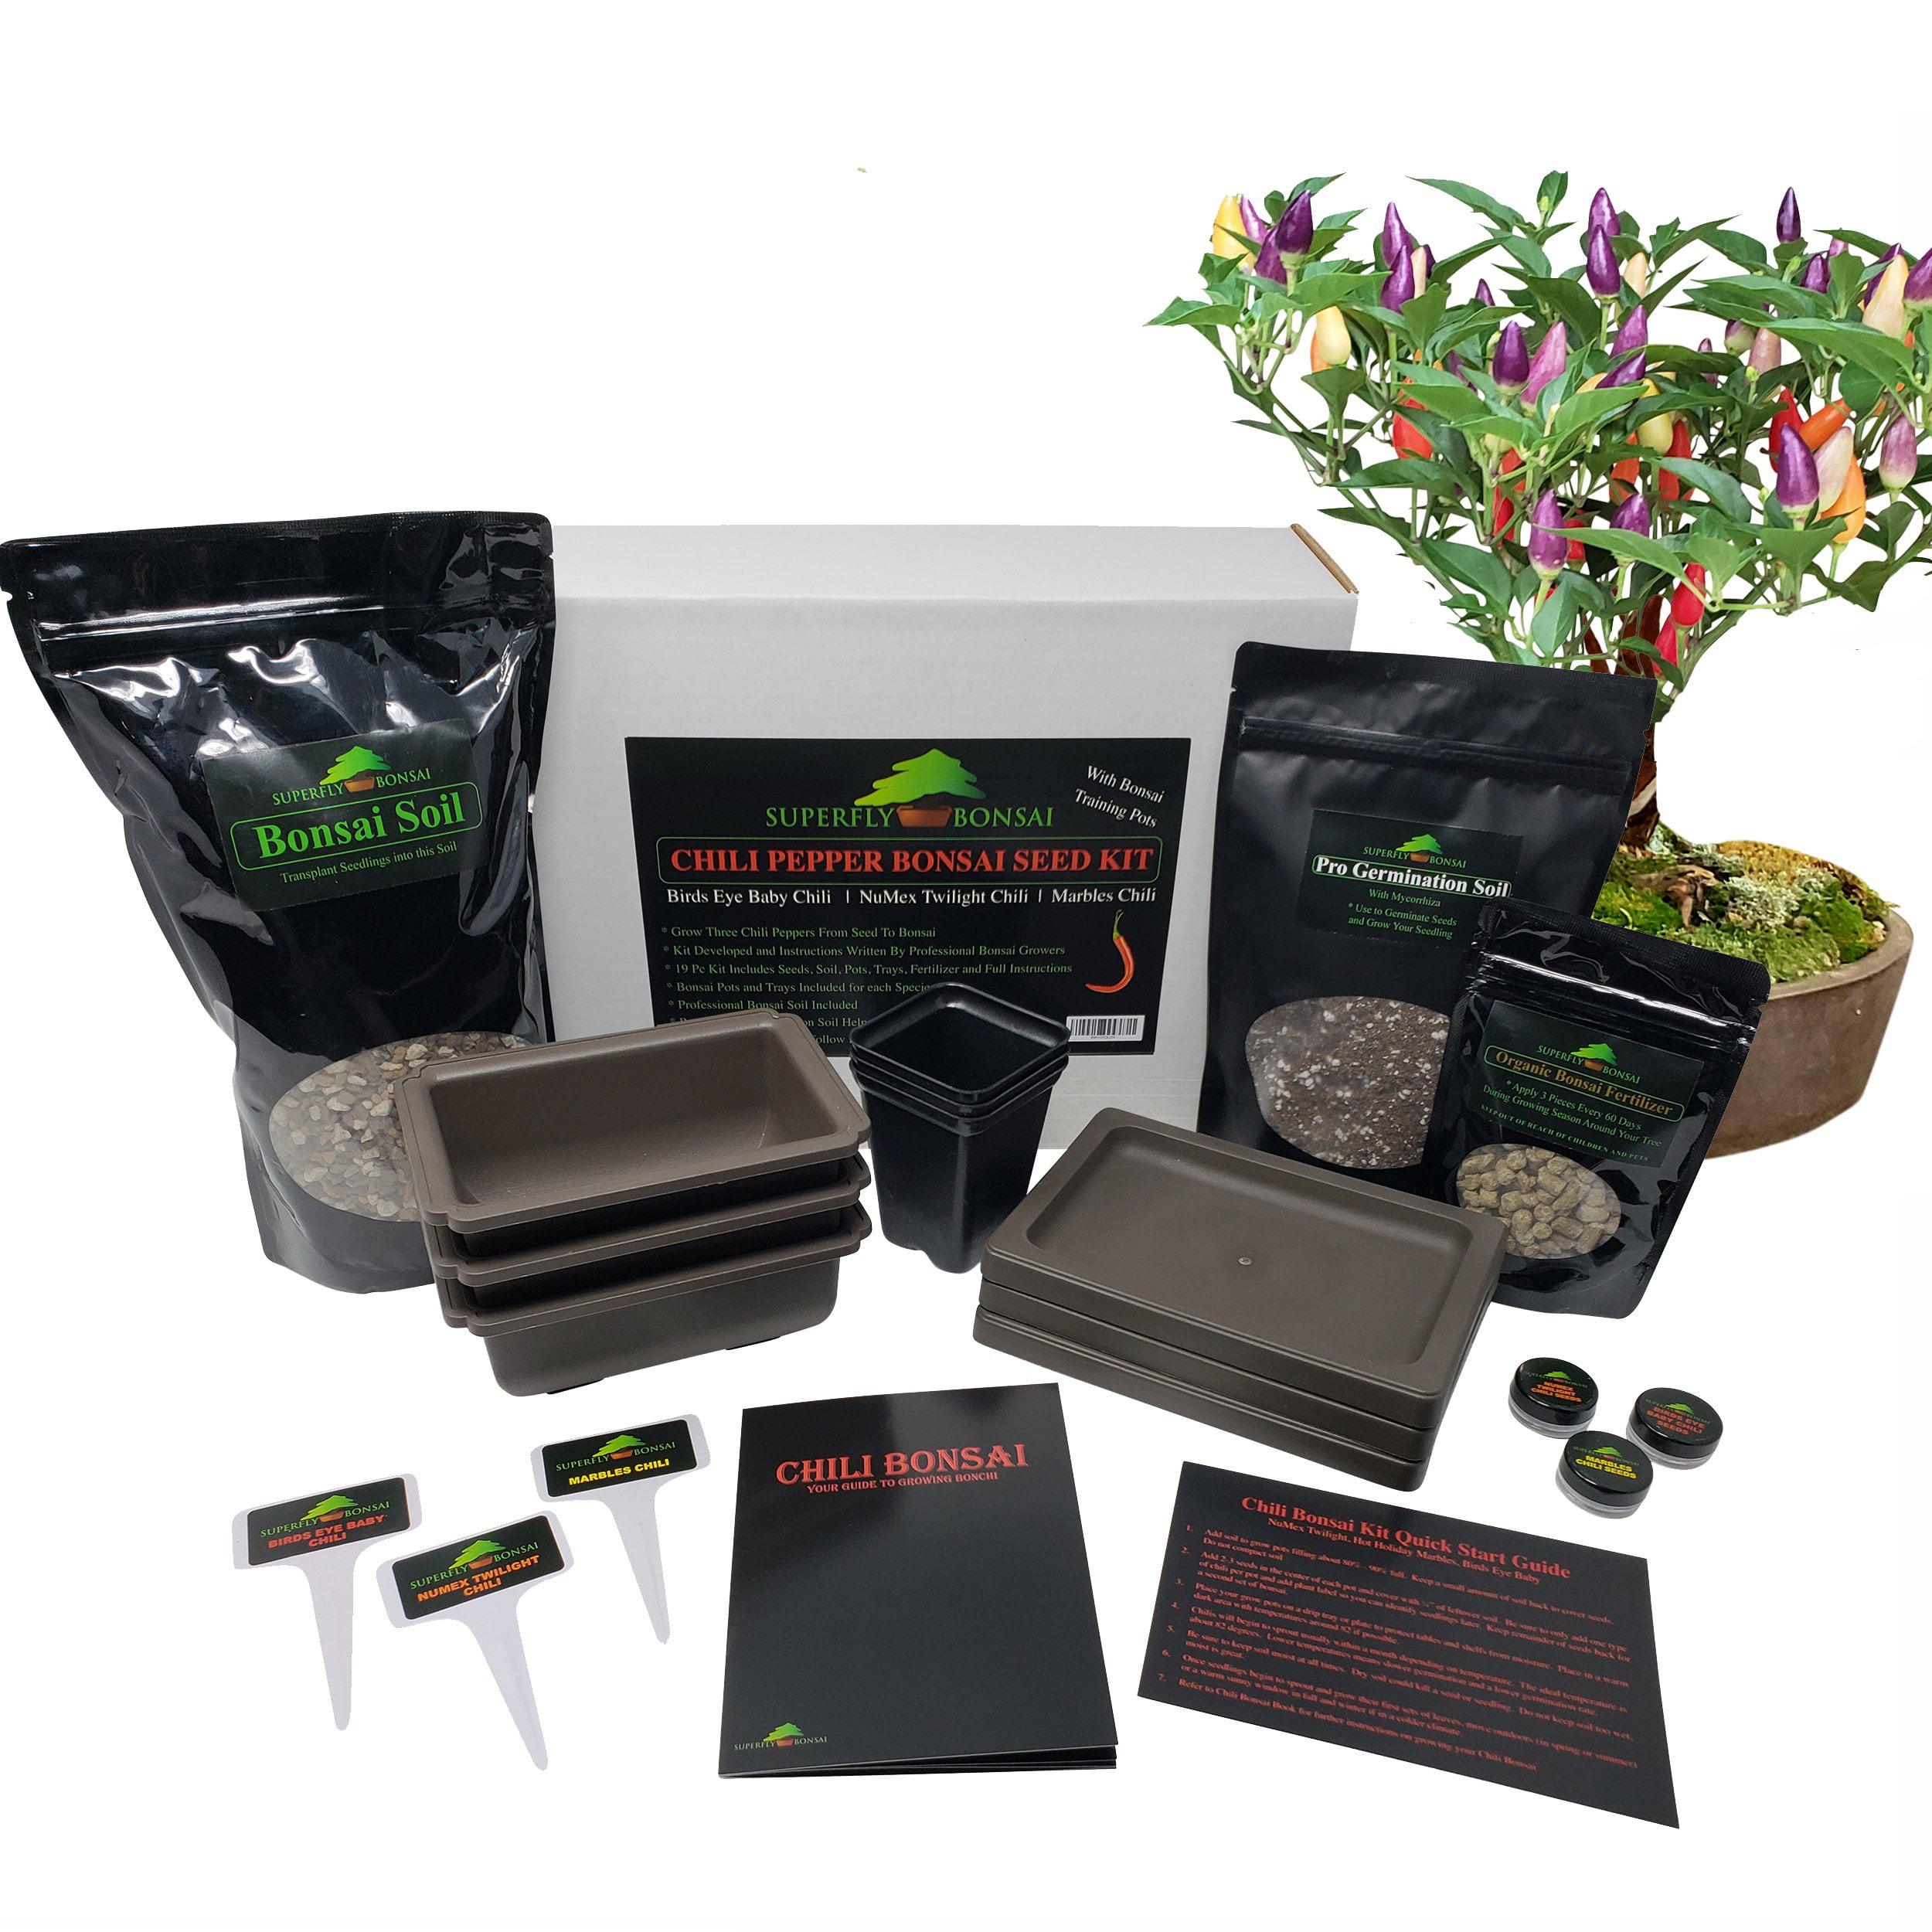 Bonchi Chili Pepper Bonsai Tree Growing Seed Kit Level3 Walmart Com Walmart Com